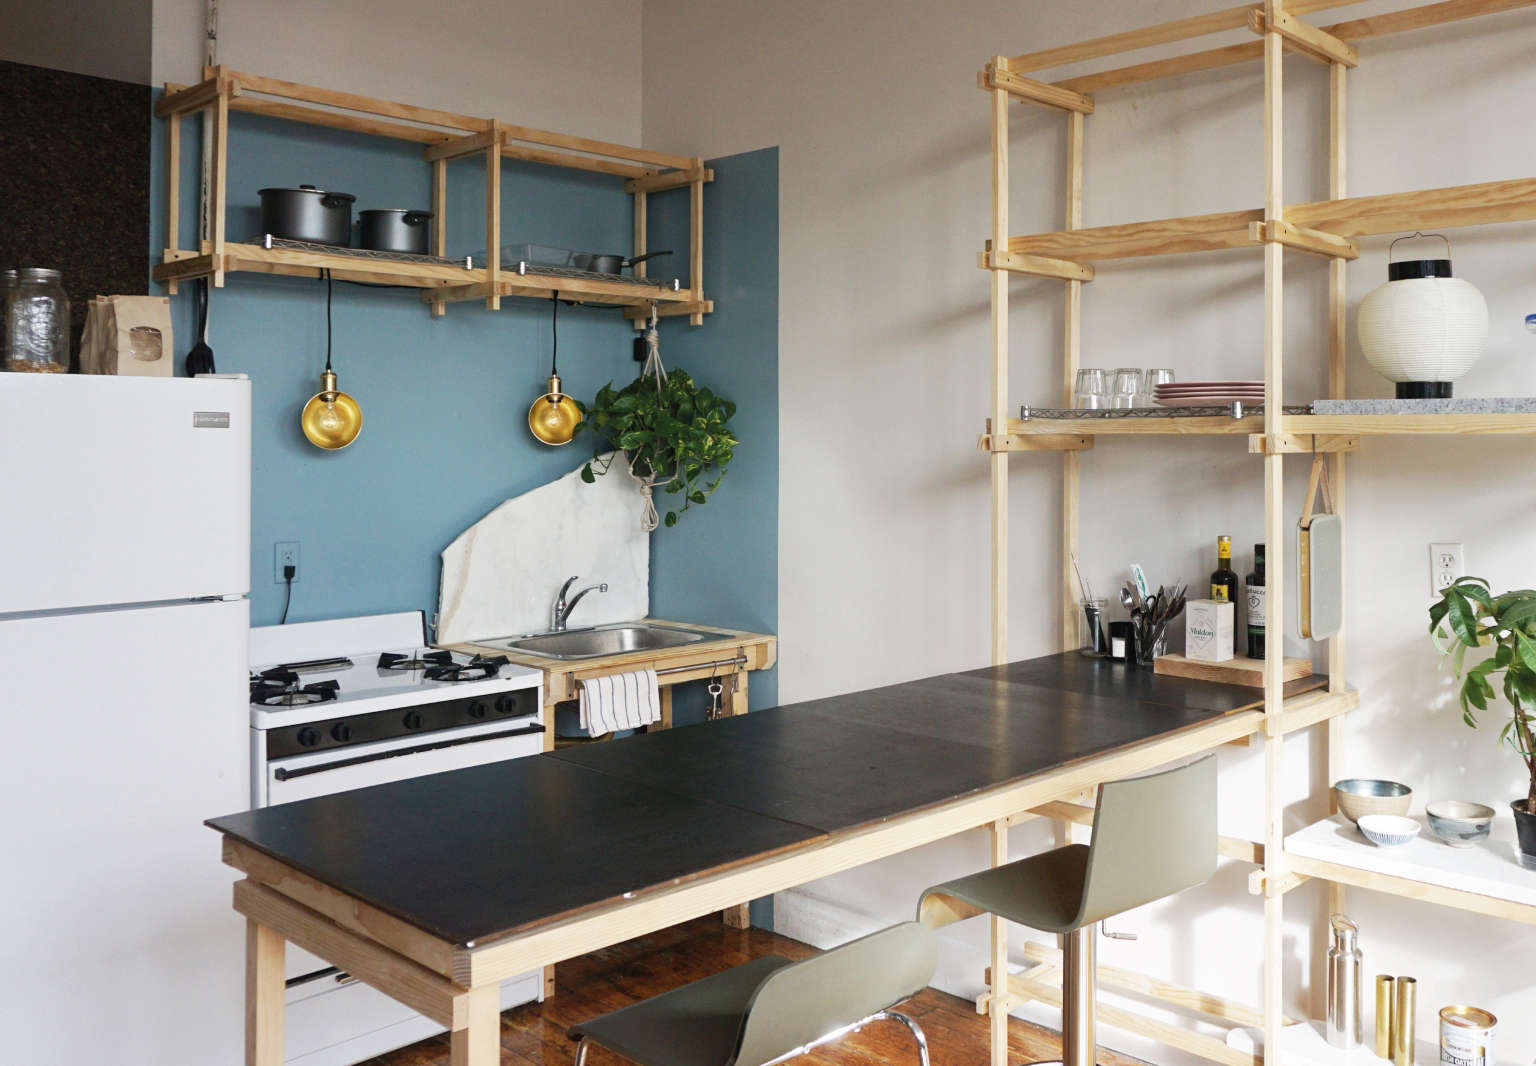 kristina line anton bak bushwick apartment kitchen counter 1536x1066